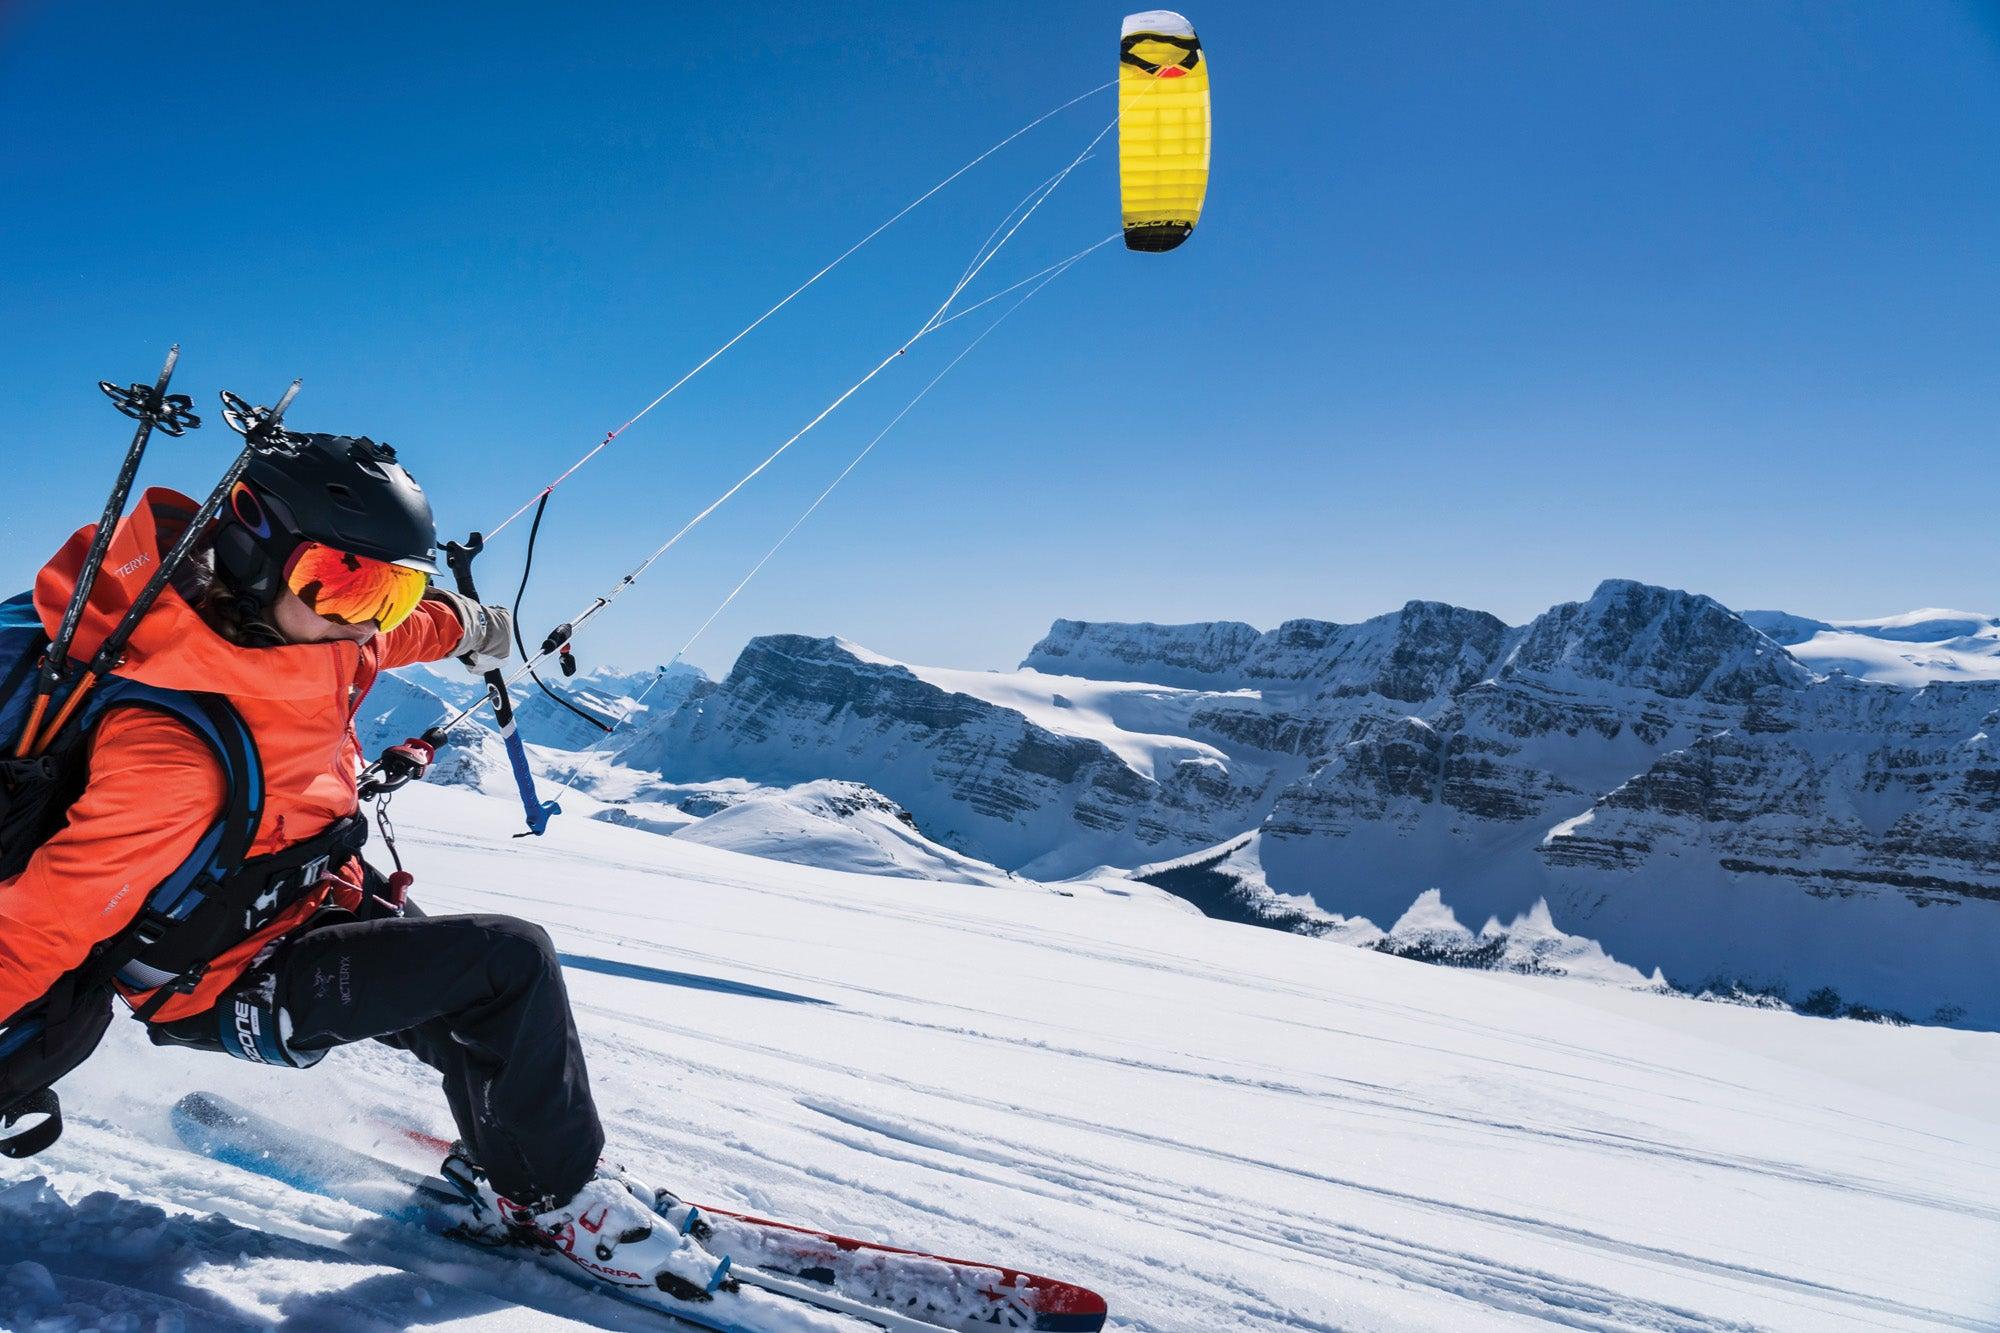 Nnow Kite Skier Lorenza Sommaruga Malaguti